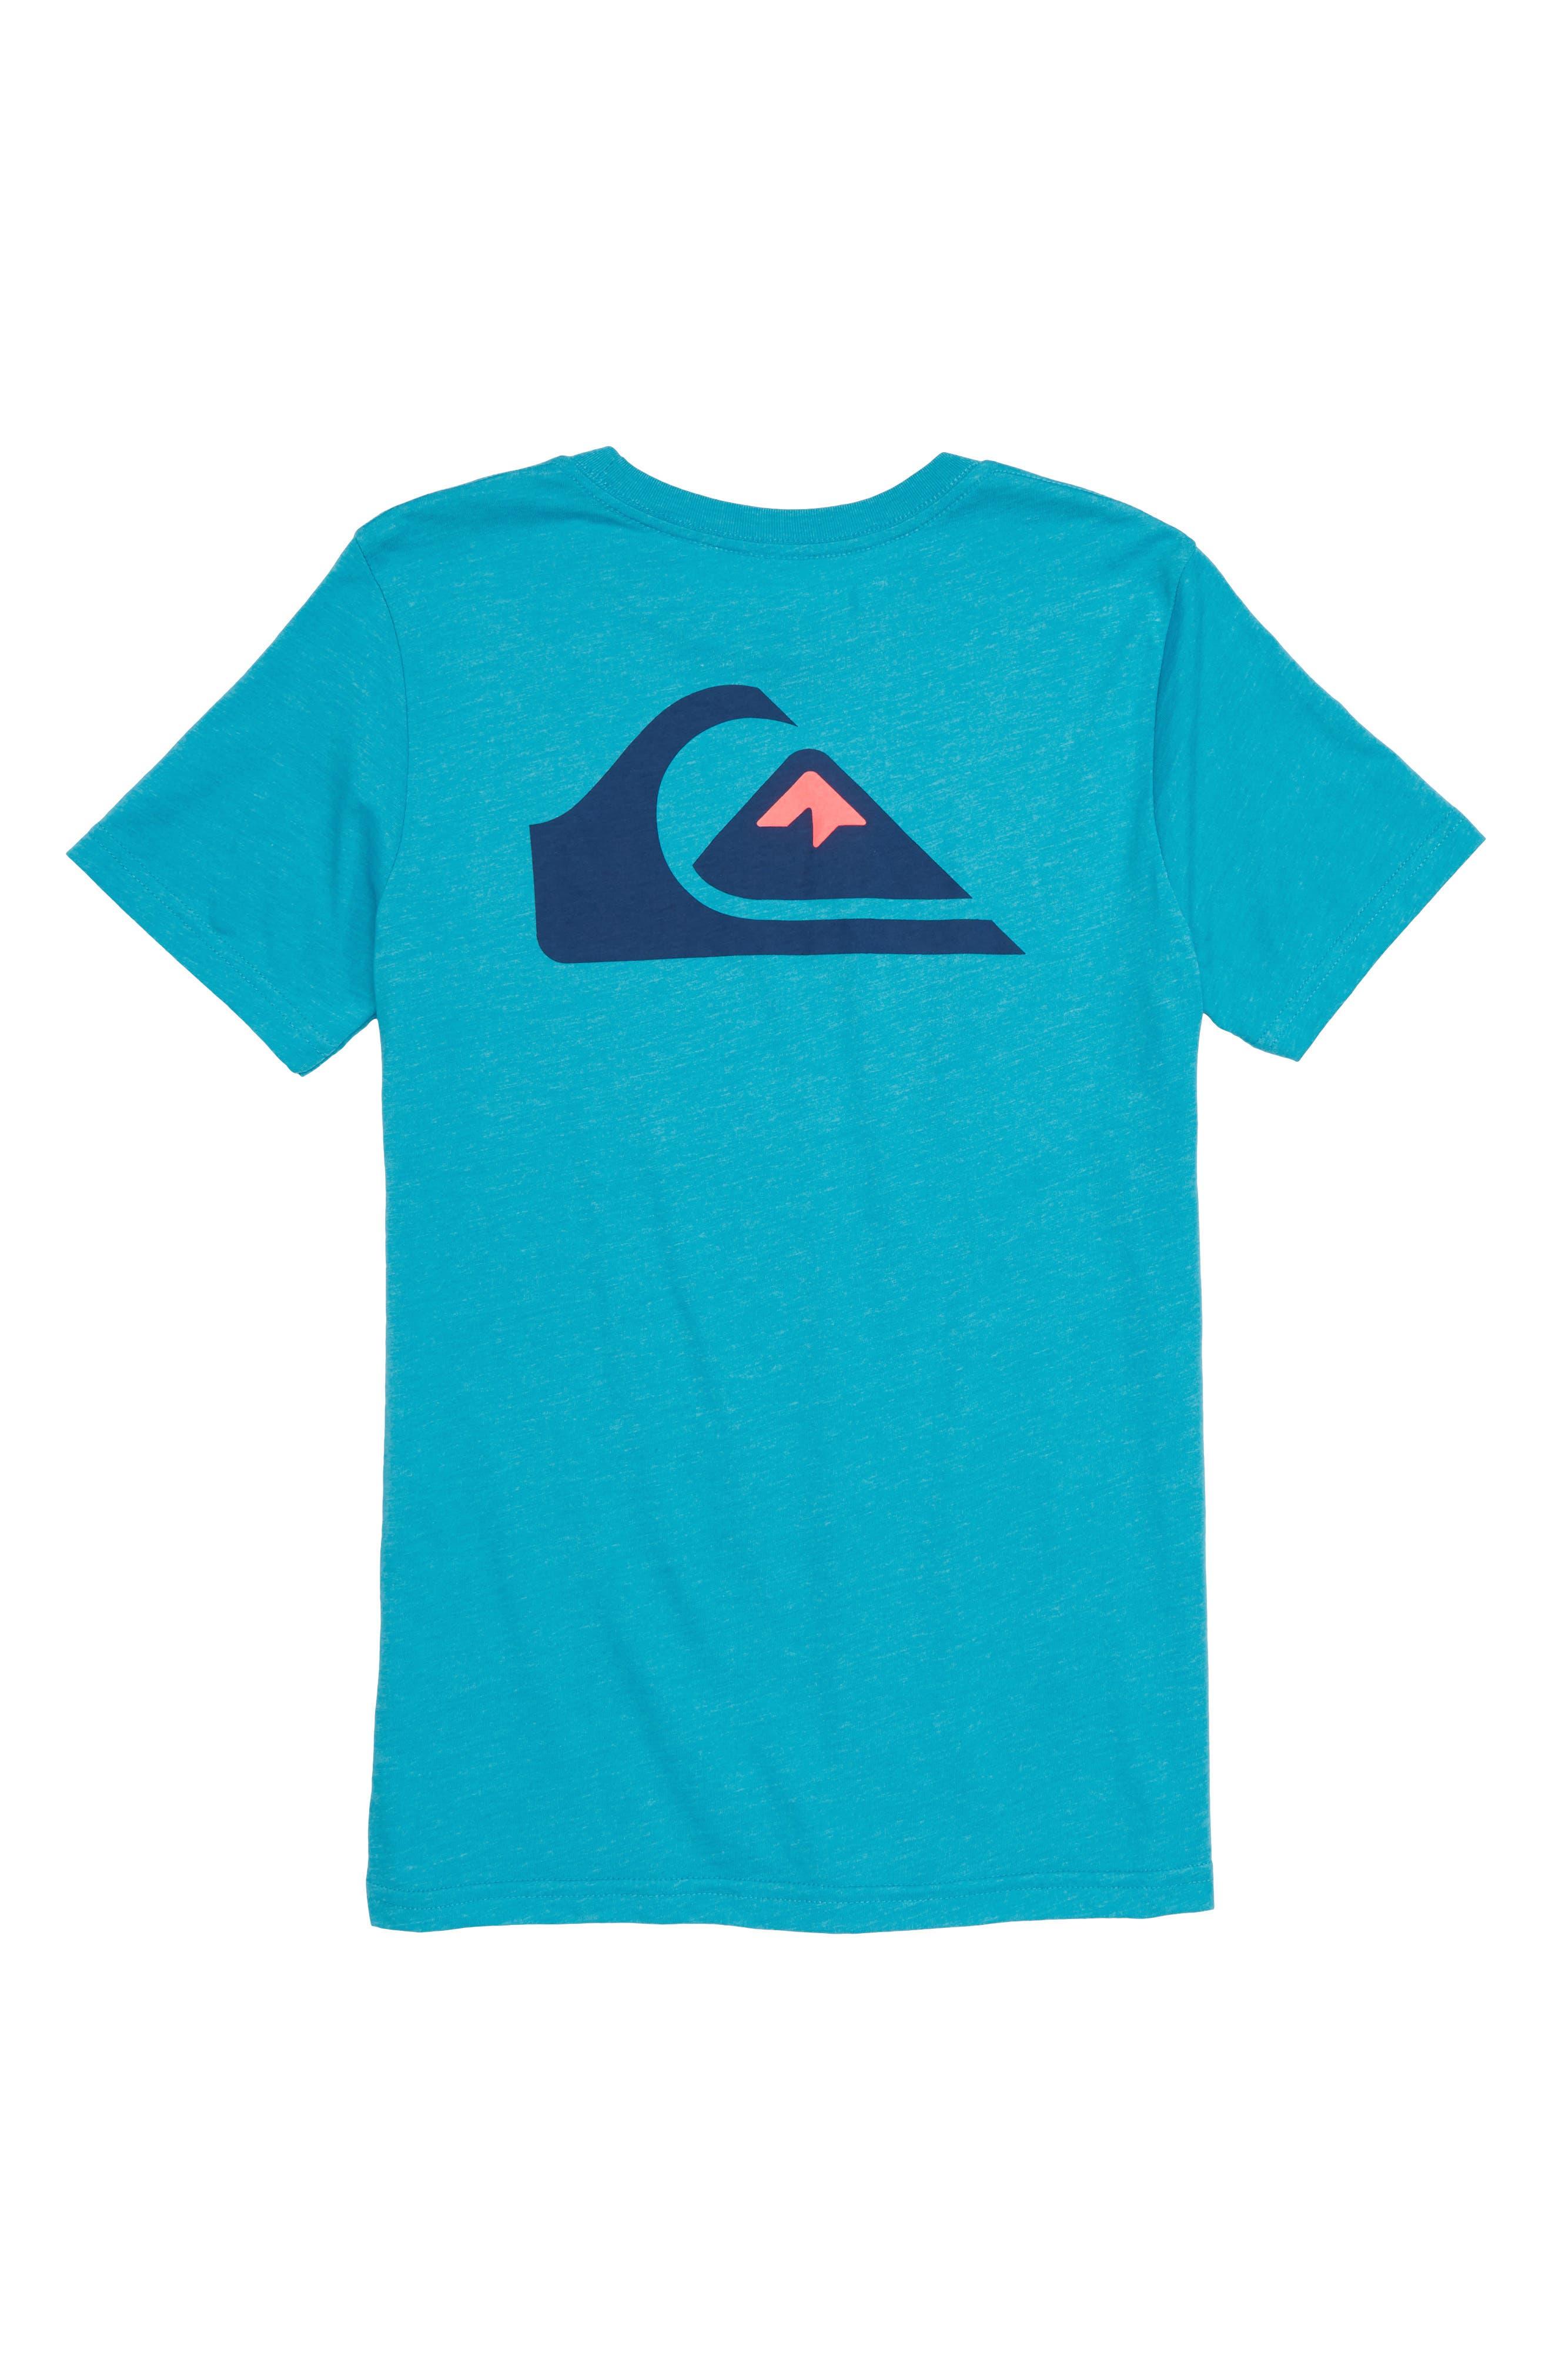 Vice Versa Graphic T-Shirt,                             Alternate thumbnail 2, color,                             Typhoon Heather